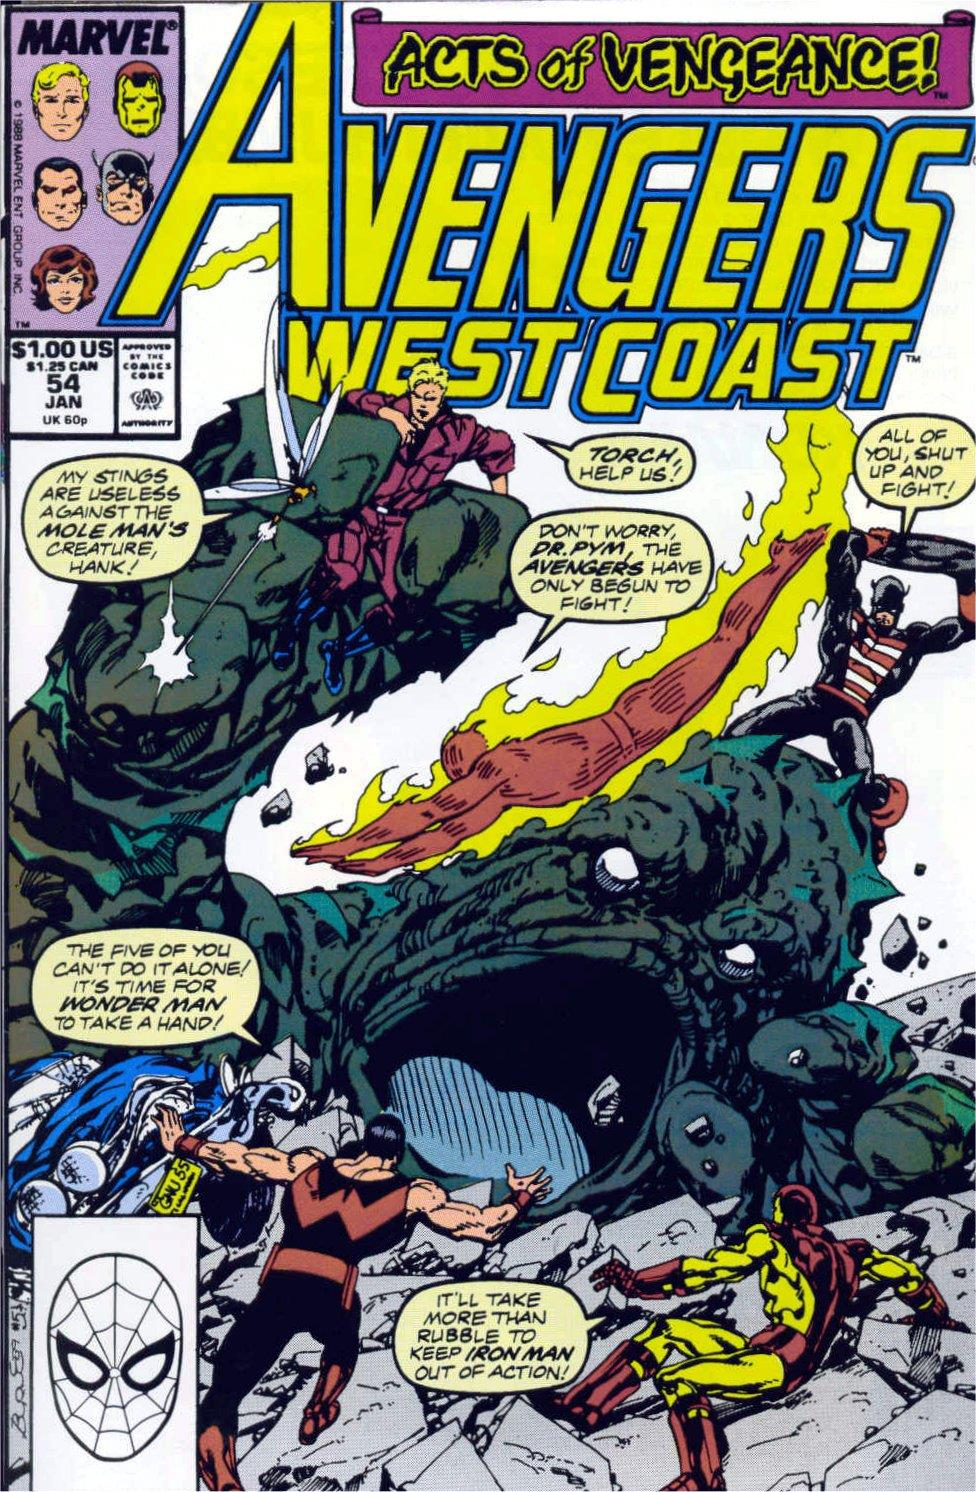 https://theunspokendecade.files.wordpress.com/2015/05/050-west-coast-avengers-54-page-1.jpg